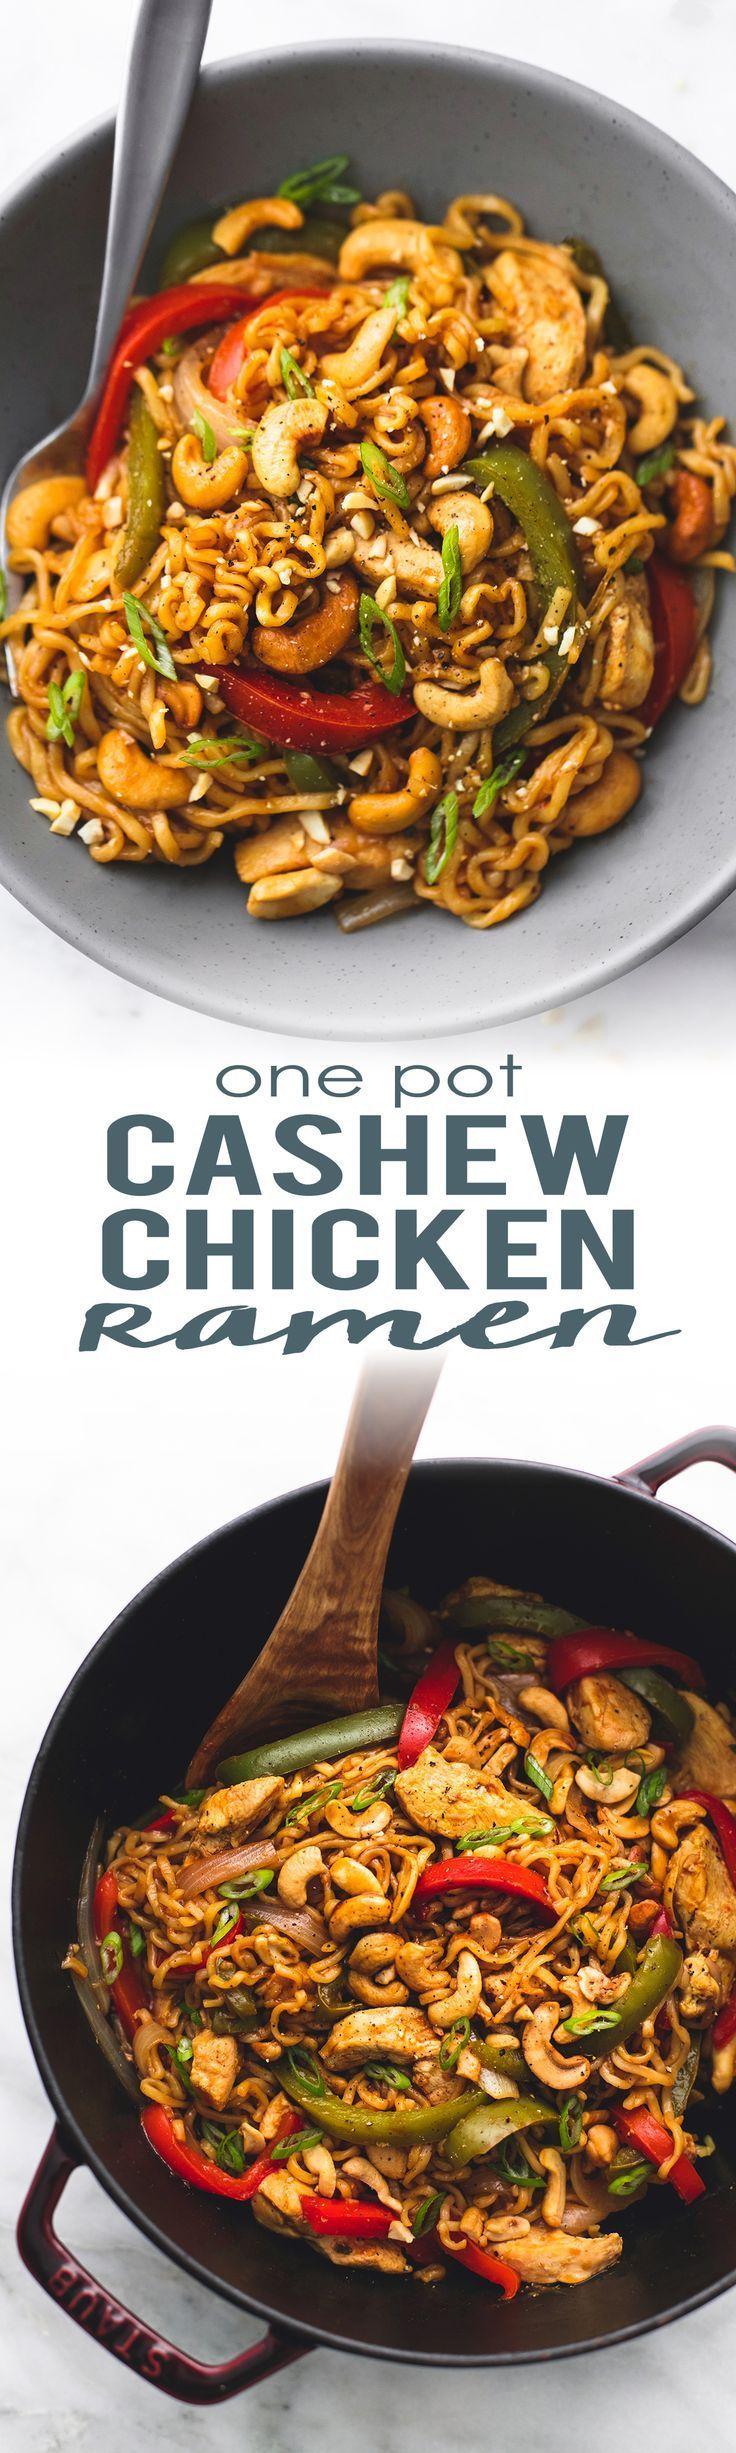 30 minute One Pot Cashew Chicken Ramen with veggies and a sweet n' savory Asian cashew stir fry sauce.